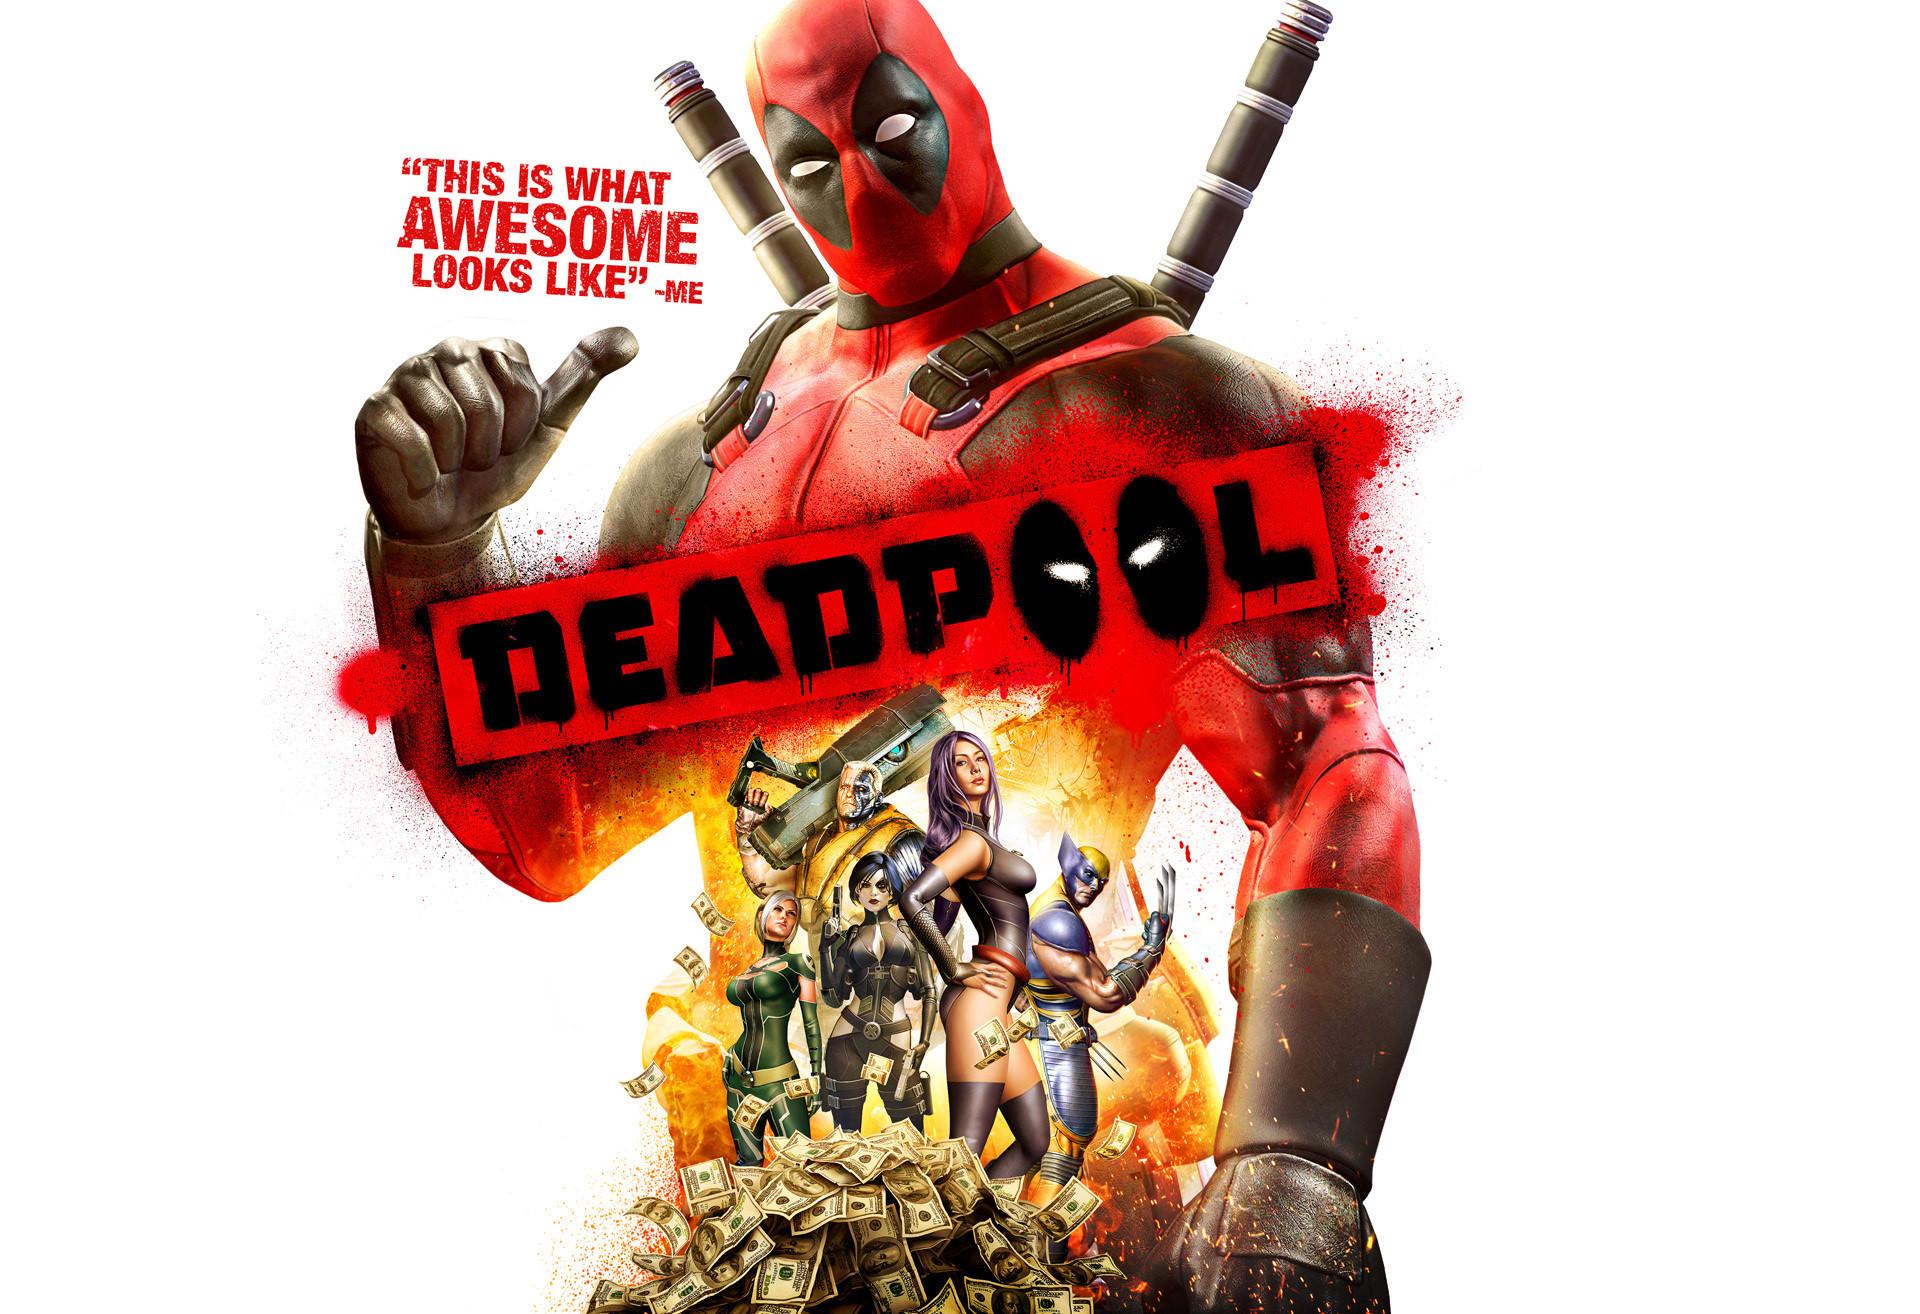 … heroes comics deadpool hero warrior superhero funny wallpaper …